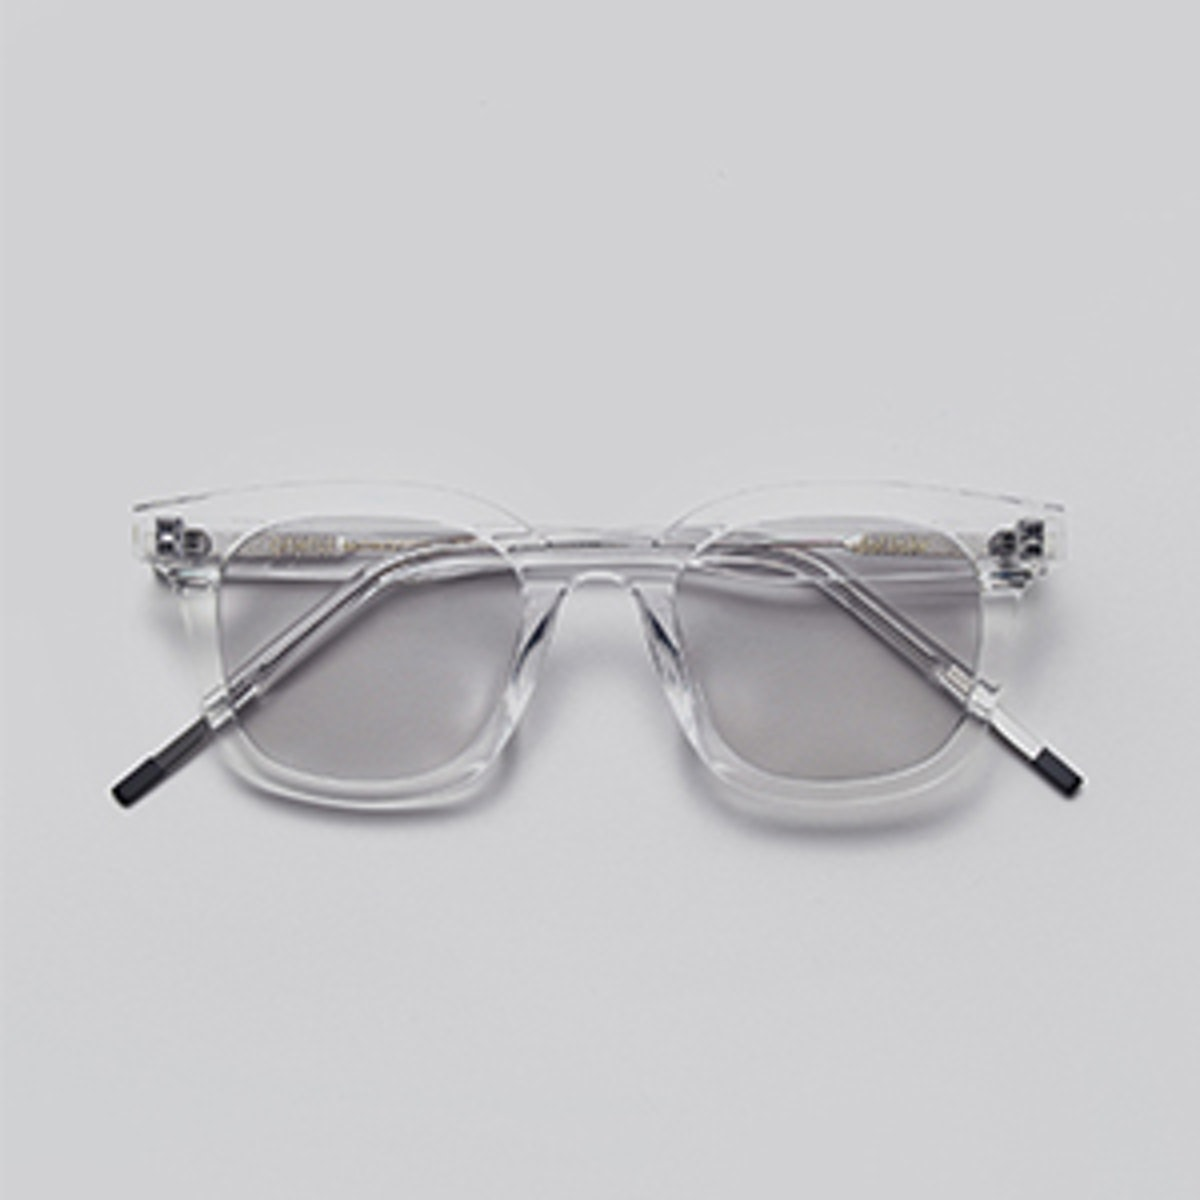 Dal Lake C1 Sunglasses